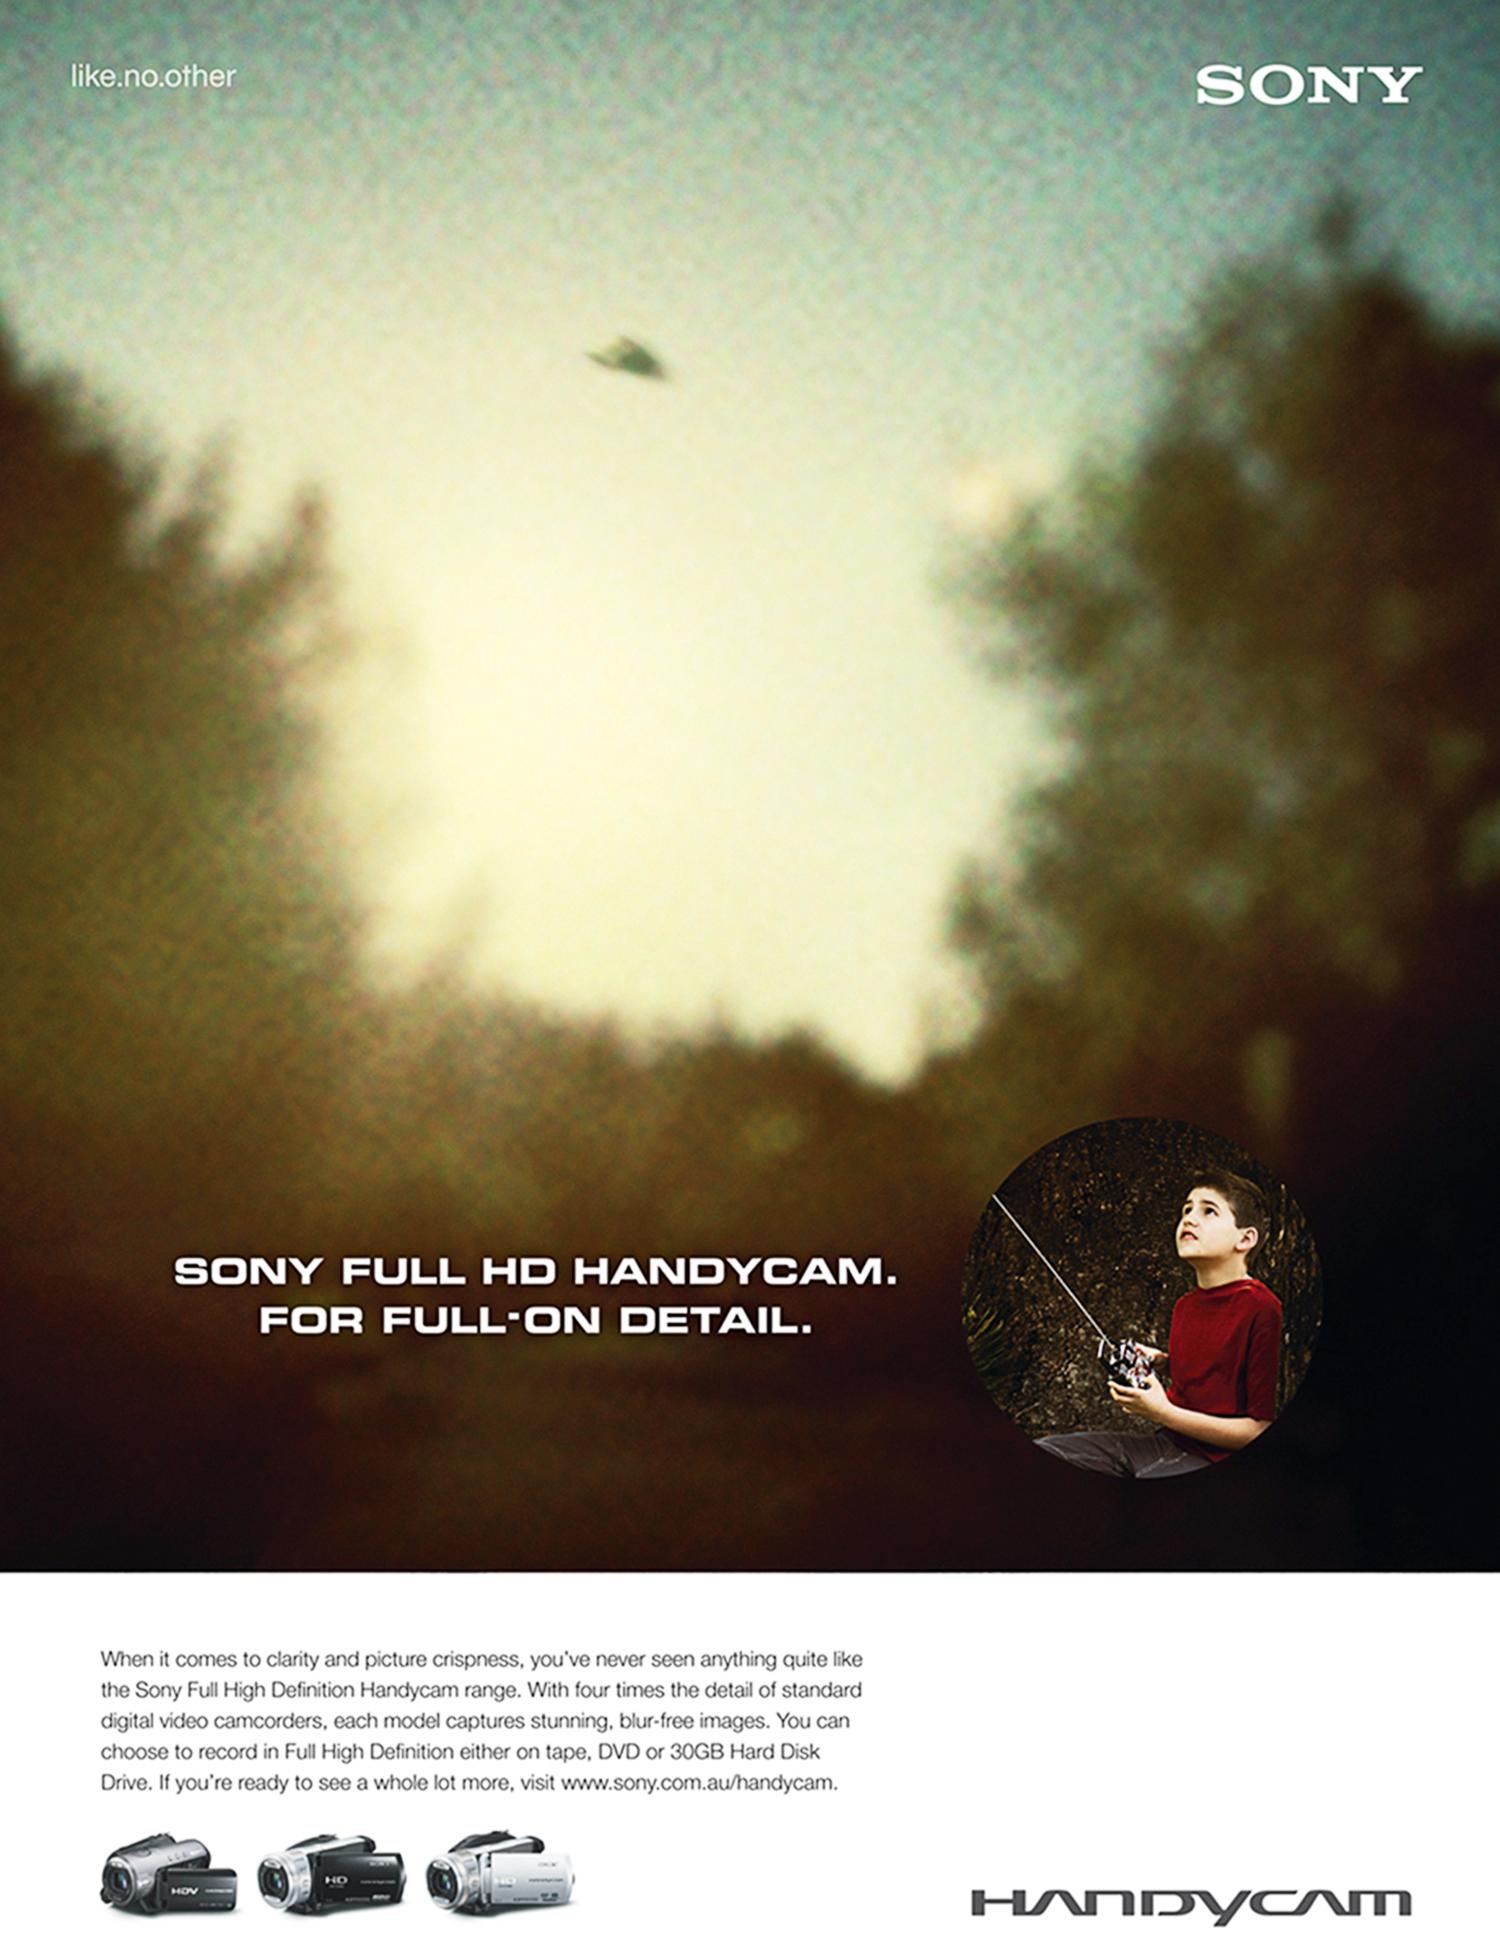 SONY-HANDYCAM-UFO-copy.jpg